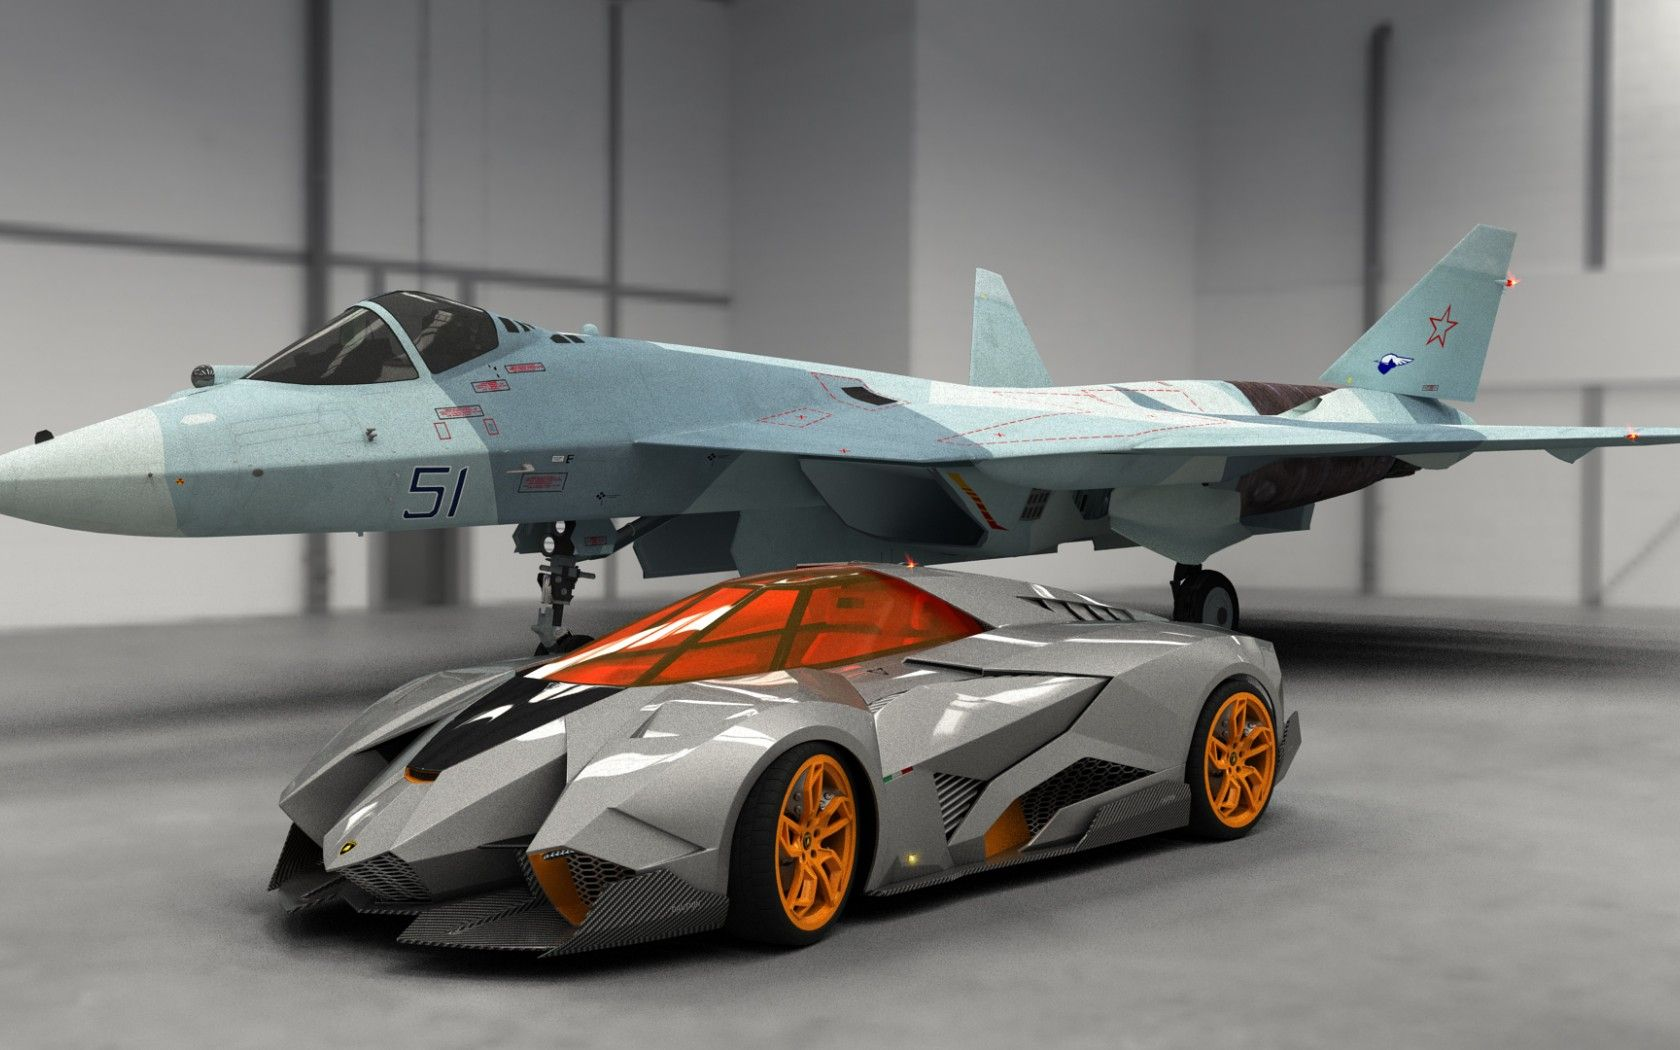 Скачать обои Lamborghini, Egoista, 2013, Concept, Car, авто, раздел  Lamborghini